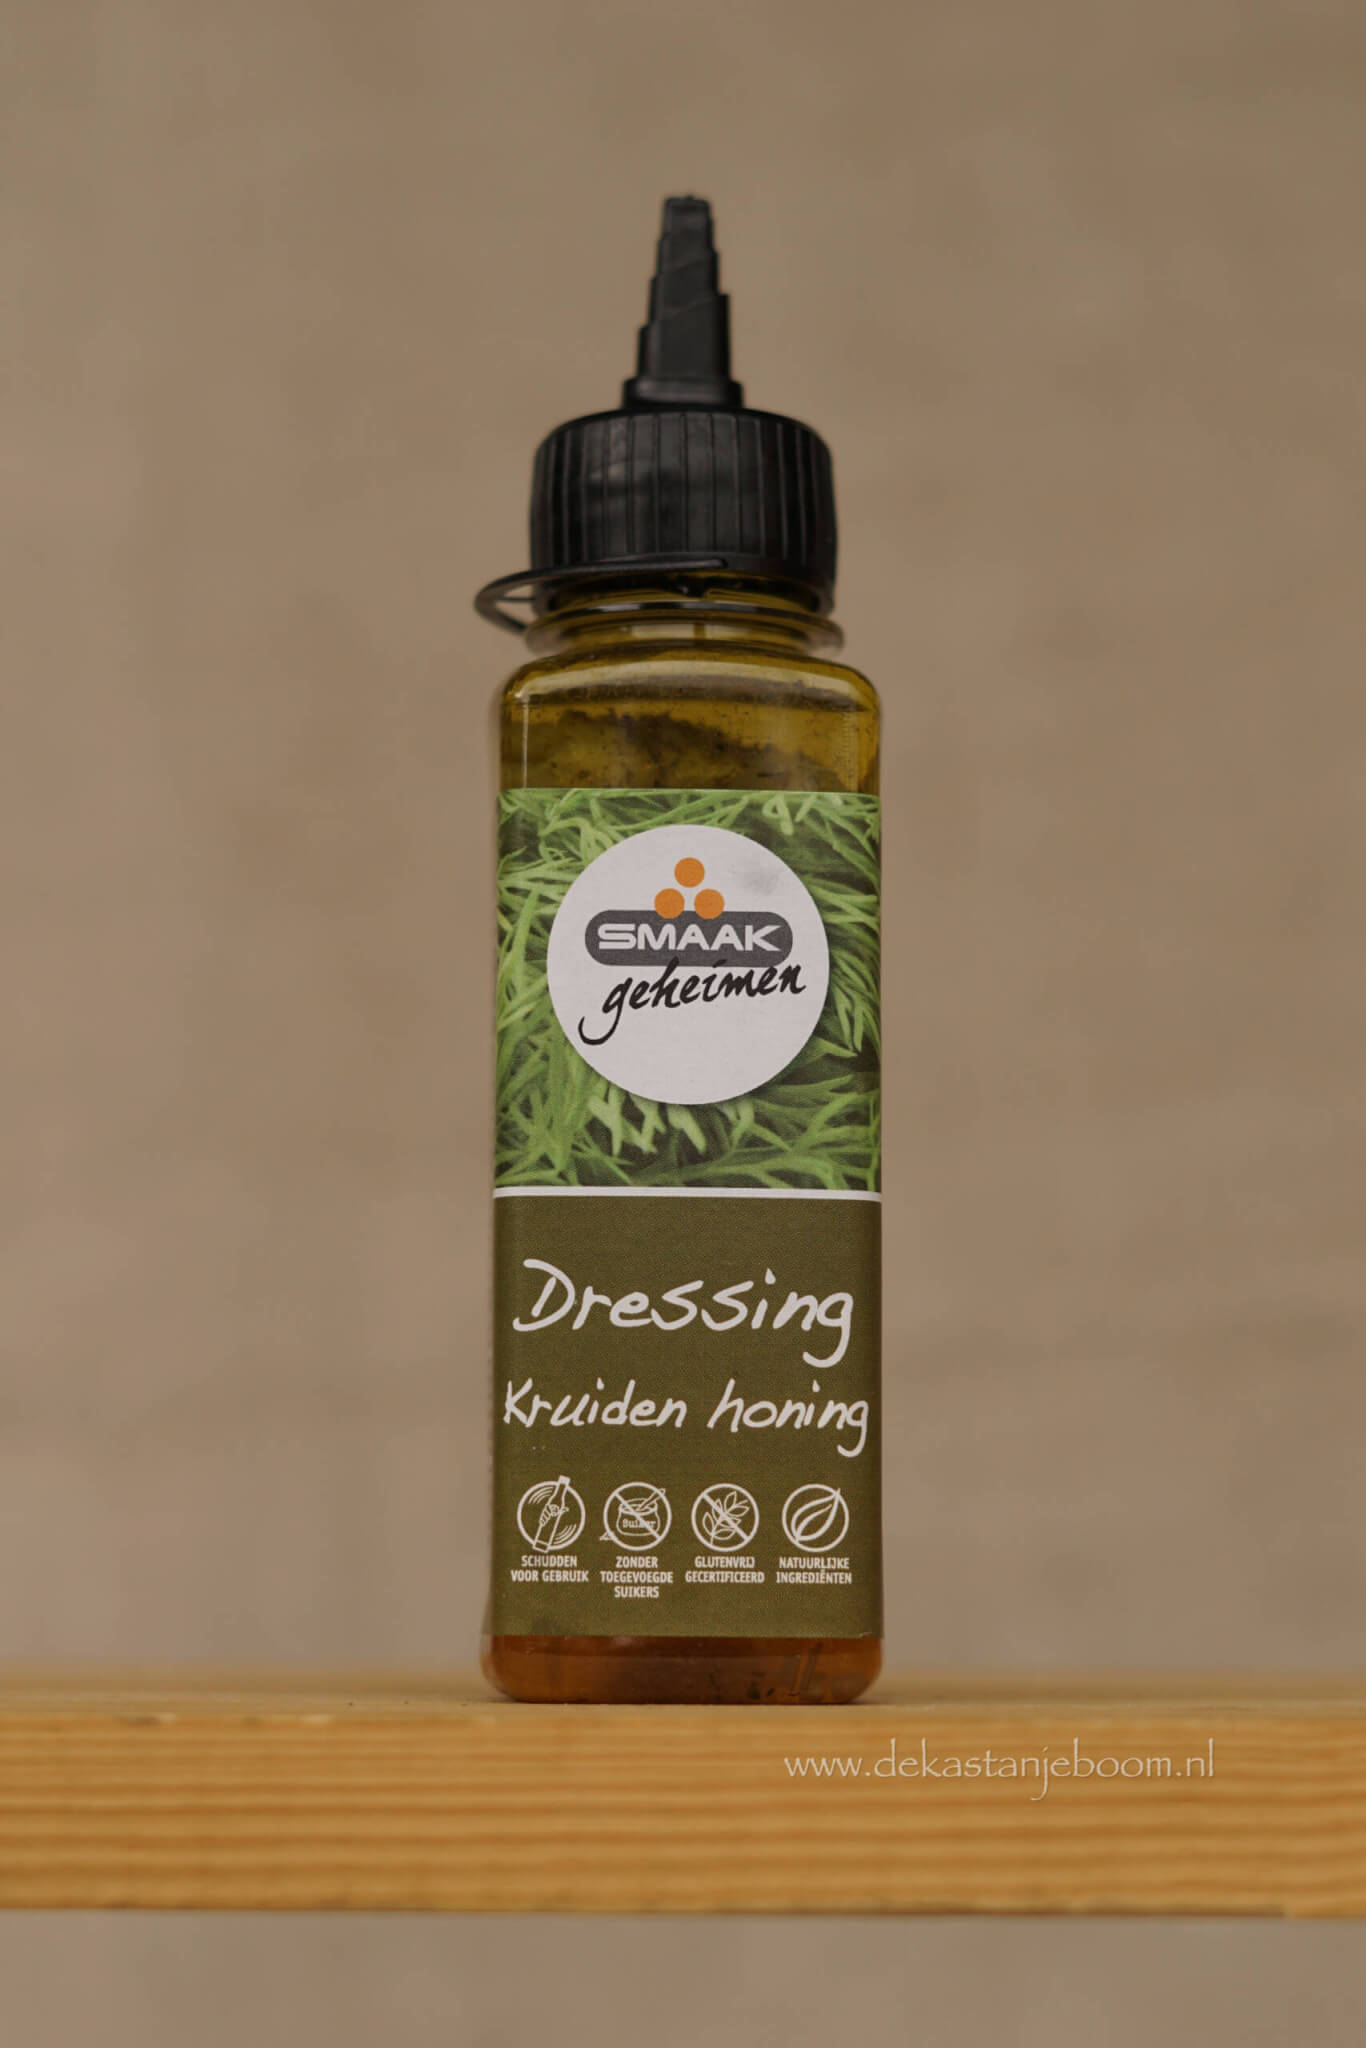 Smaakgeheimen dressing kruiden honing